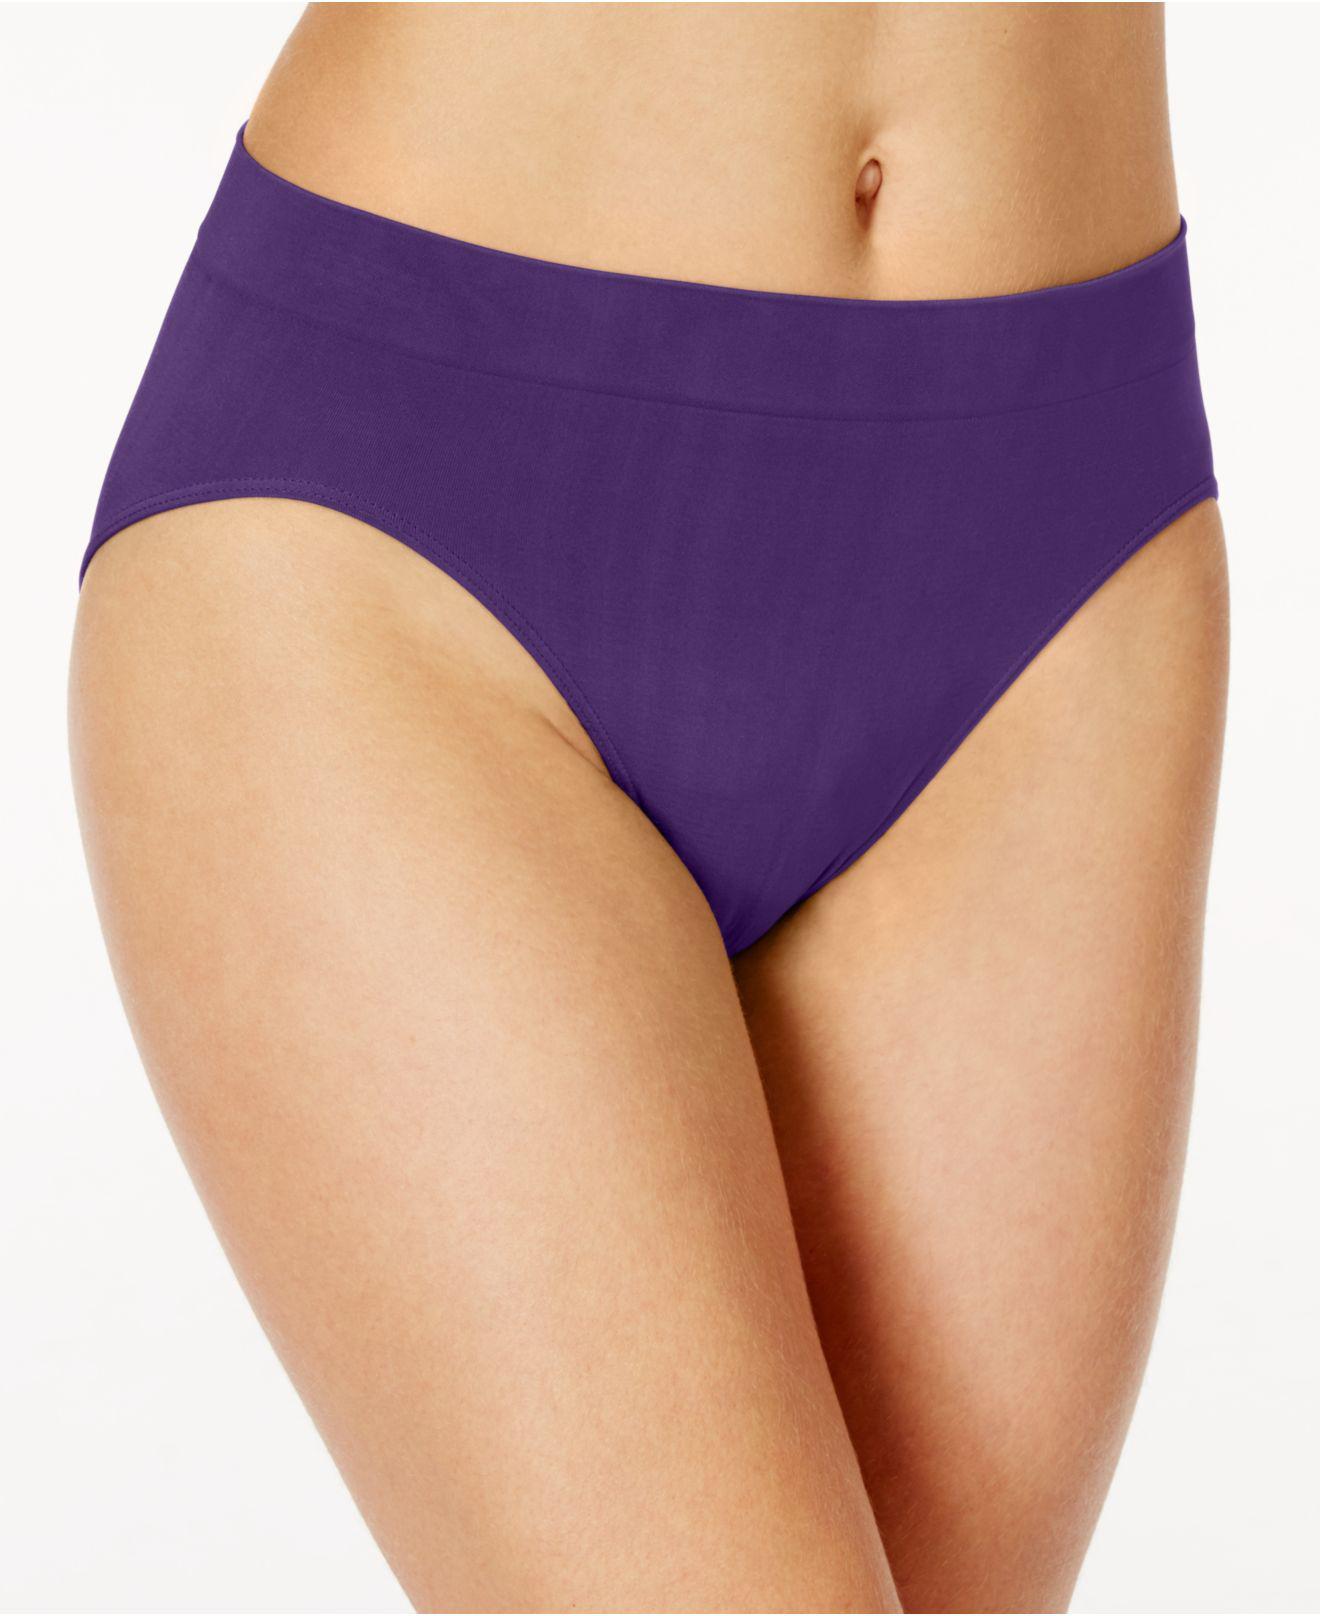 NWT Women/'s JOCKEY 3 Seamfree Hi Cuts Microfiber Stretch Panties Underwear